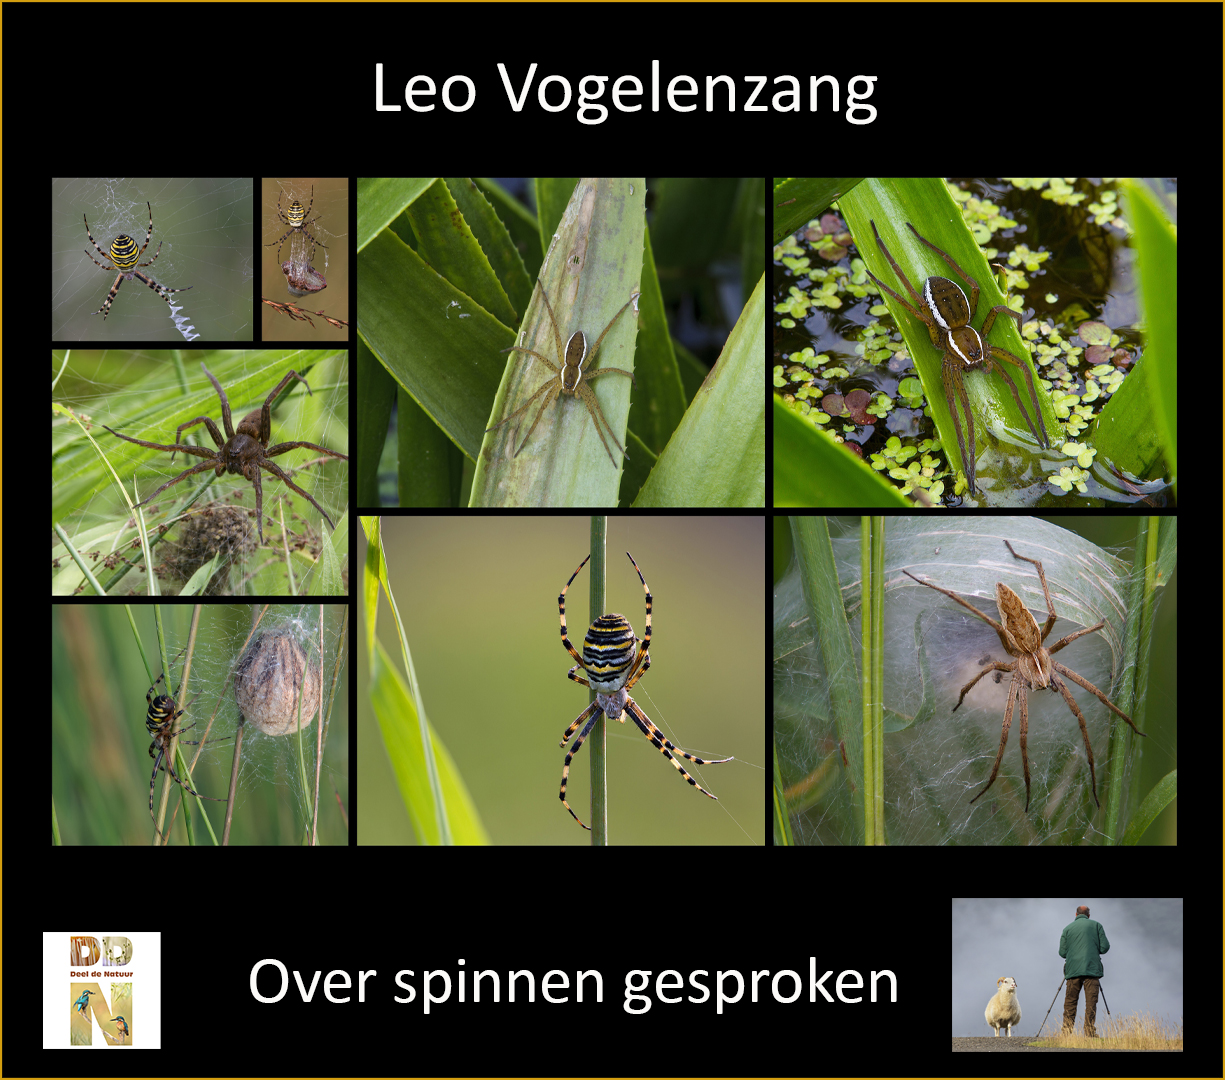 Leo Vogelenzang - Over spinnen gesproken Spotlight